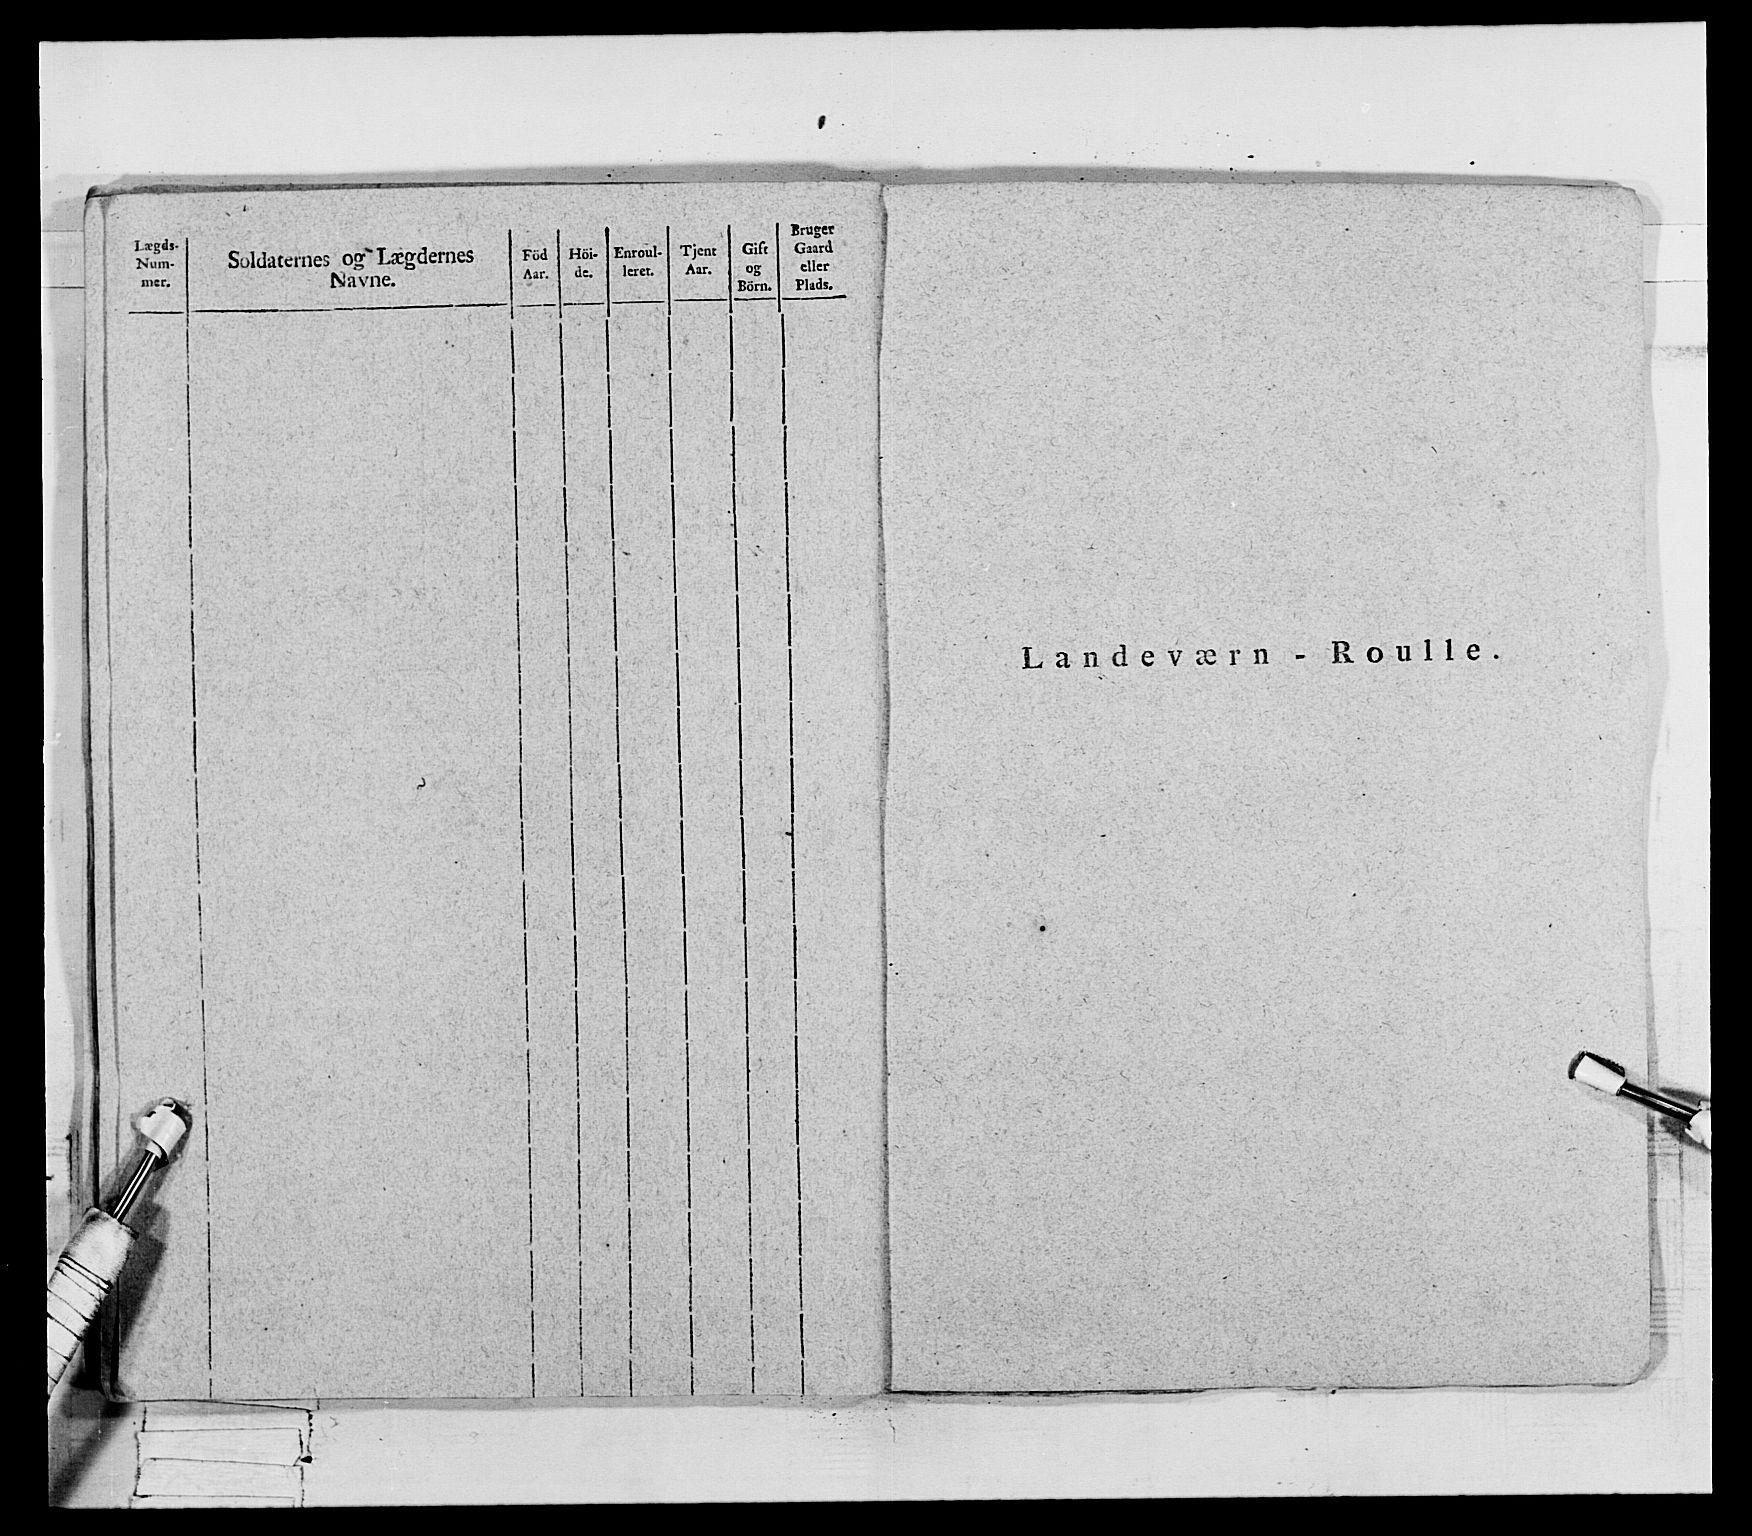 RA, Generalitets- og kommissariatskollegiet, Det kongelige norske kommissariatskollegium, E/Eh/L0069: Opplandske gevorbne infanteriregiment, 1810-1818, s. 347